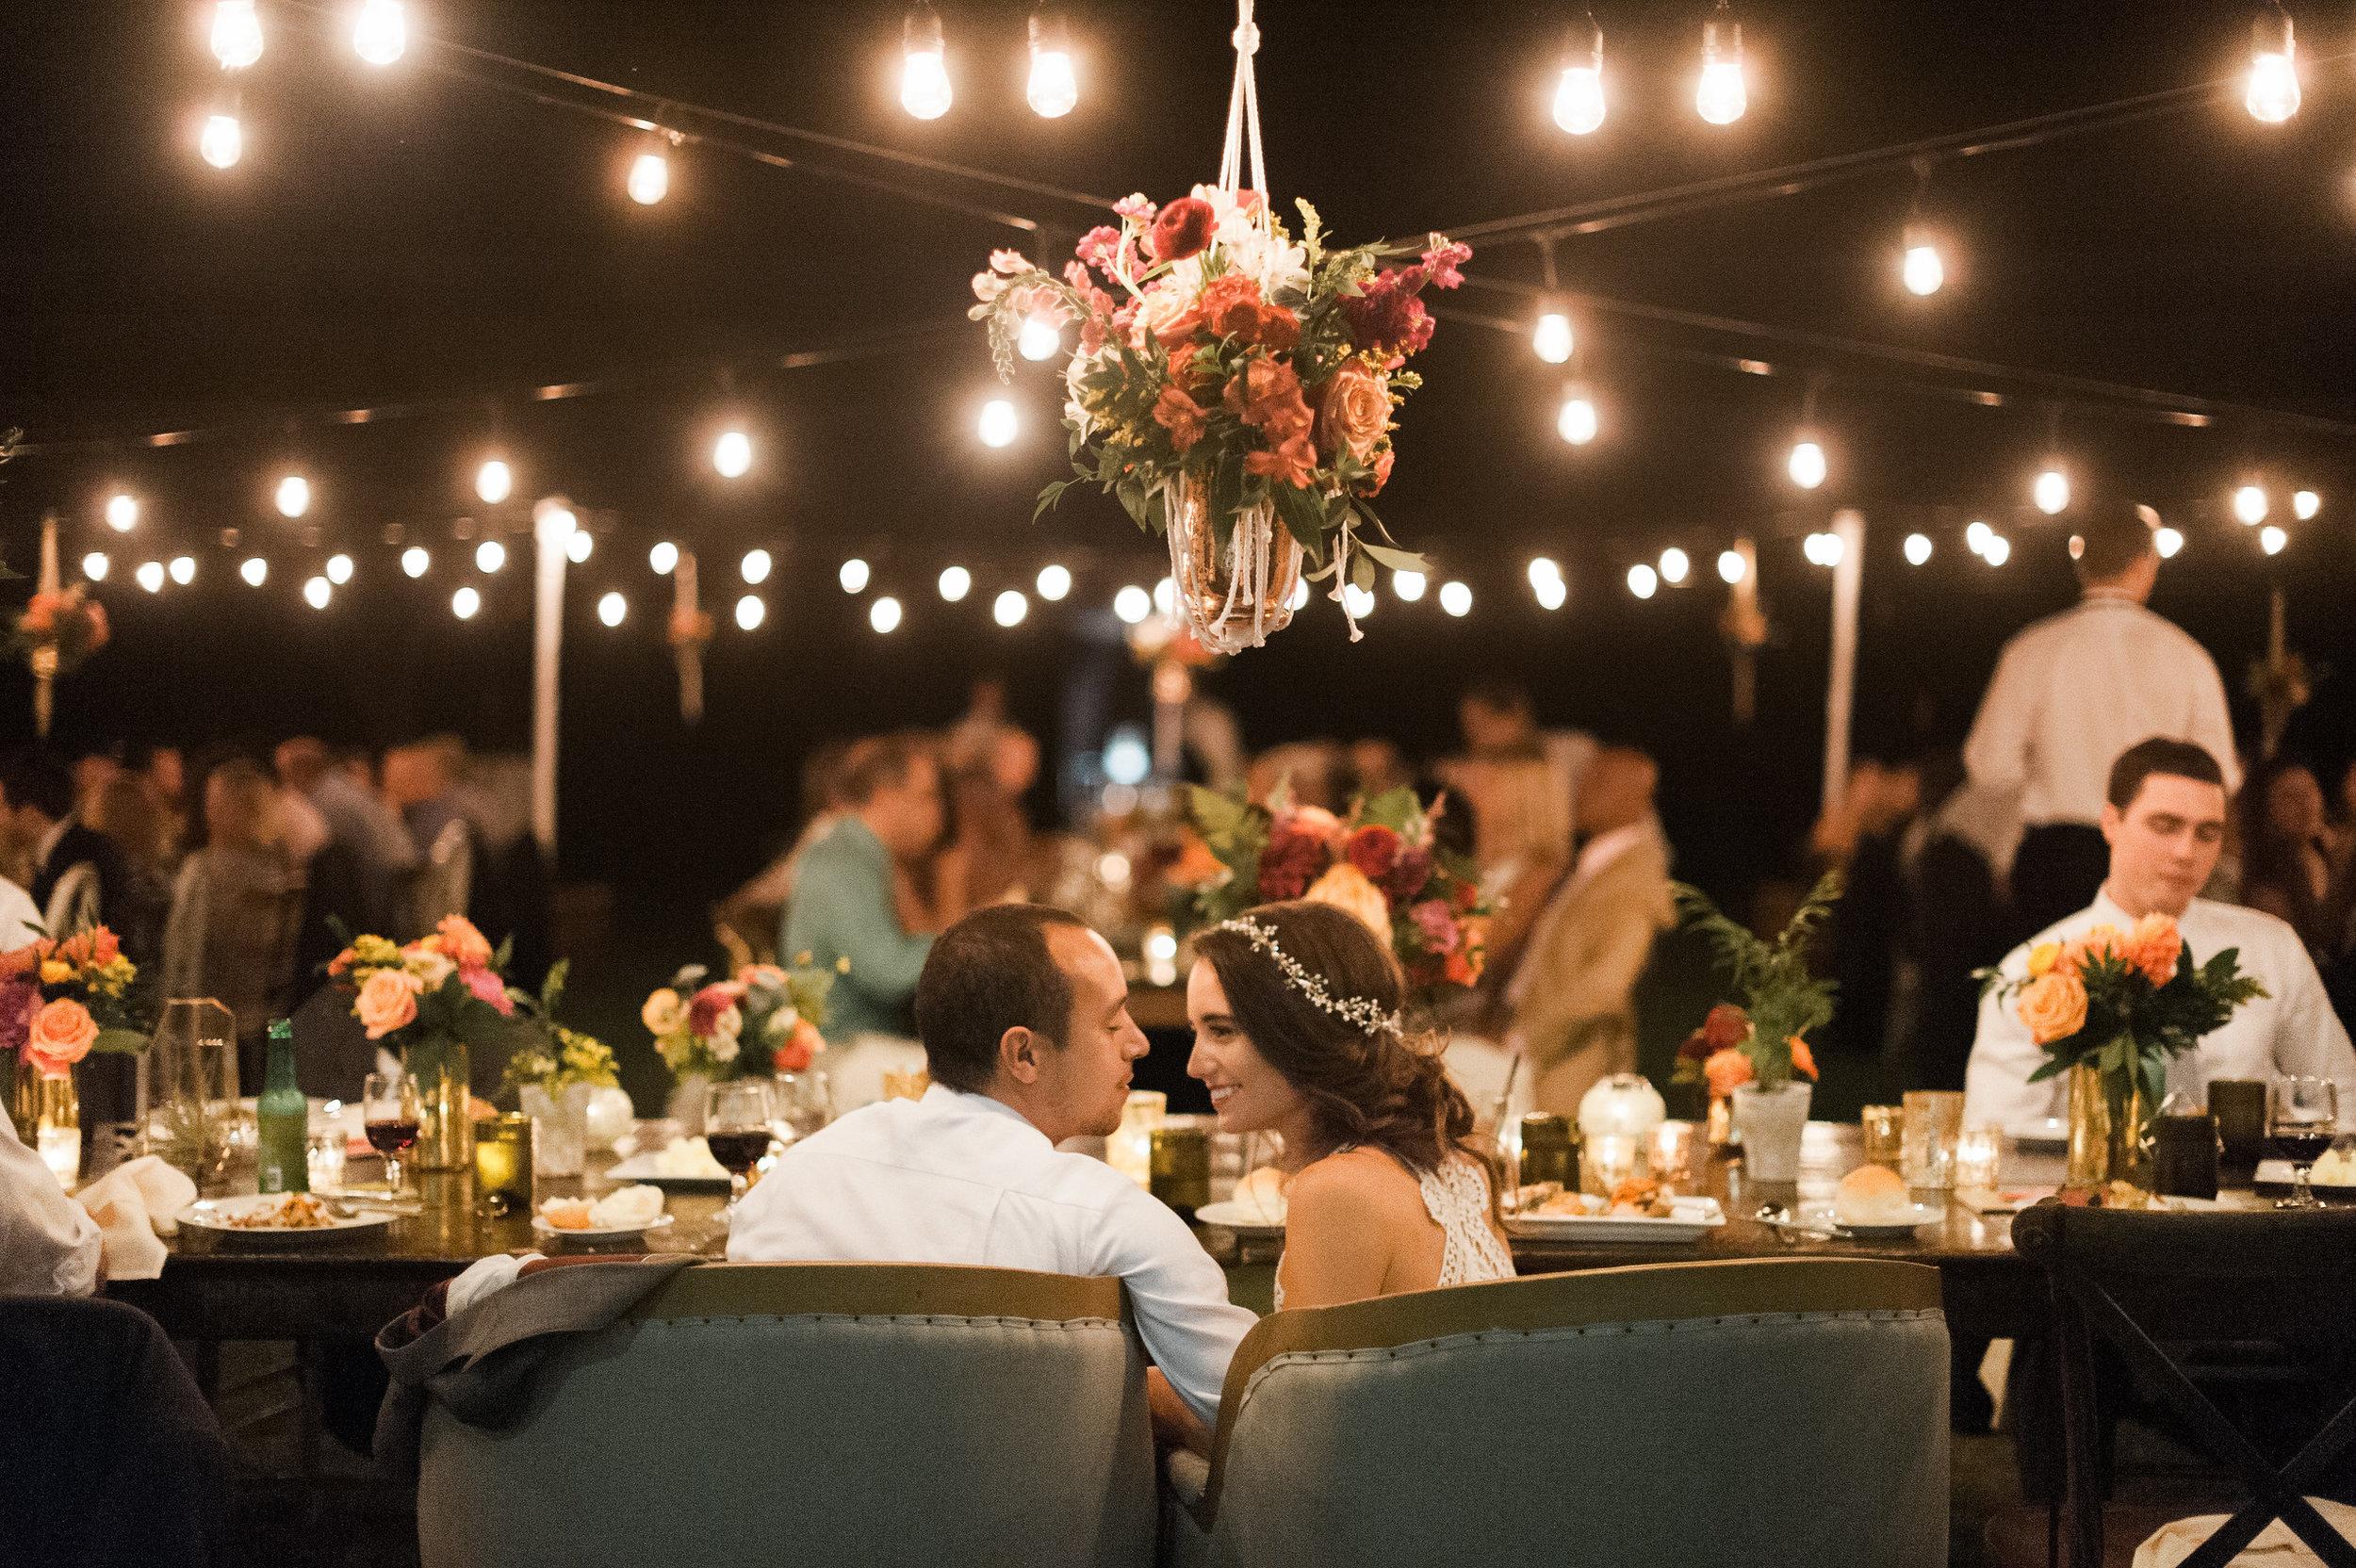 thomas-wedding-442-X5.jpg